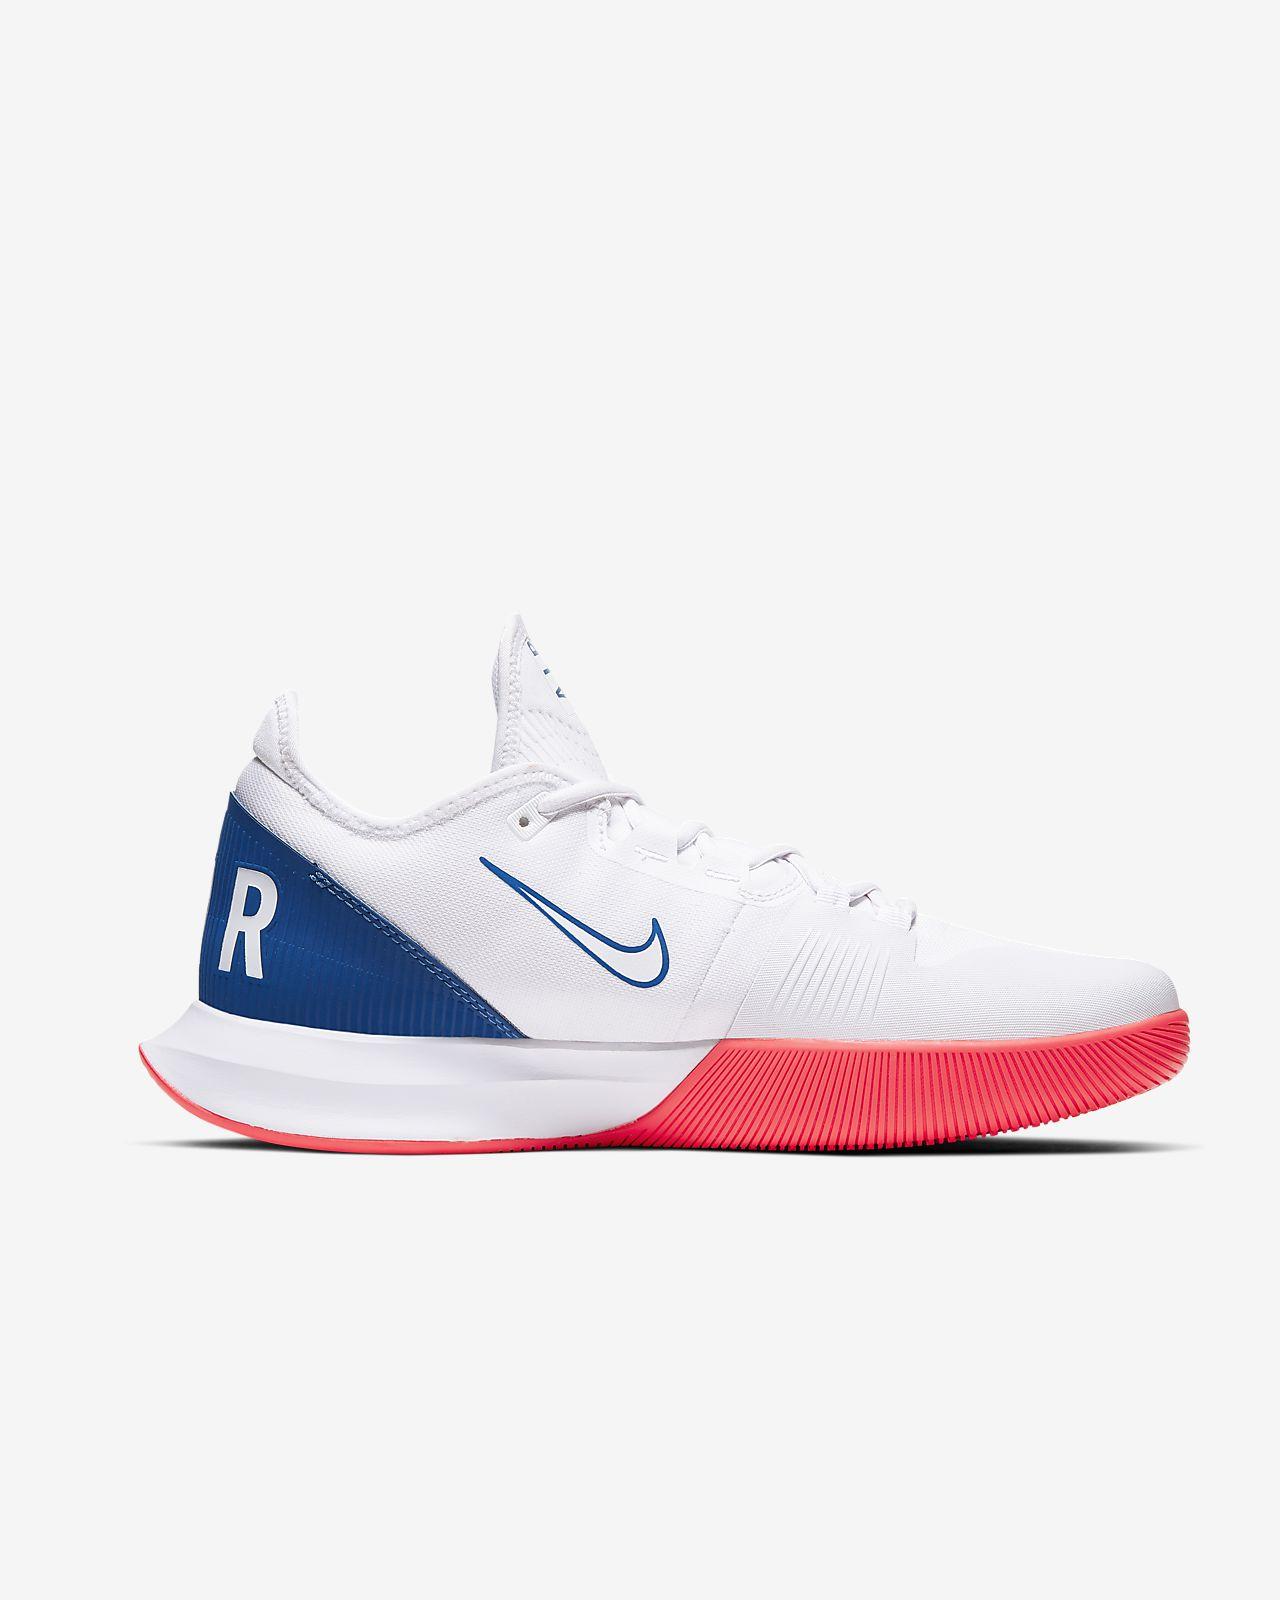 Chaussure de tennis NikeCourt Air Max Wildcard pour Homme